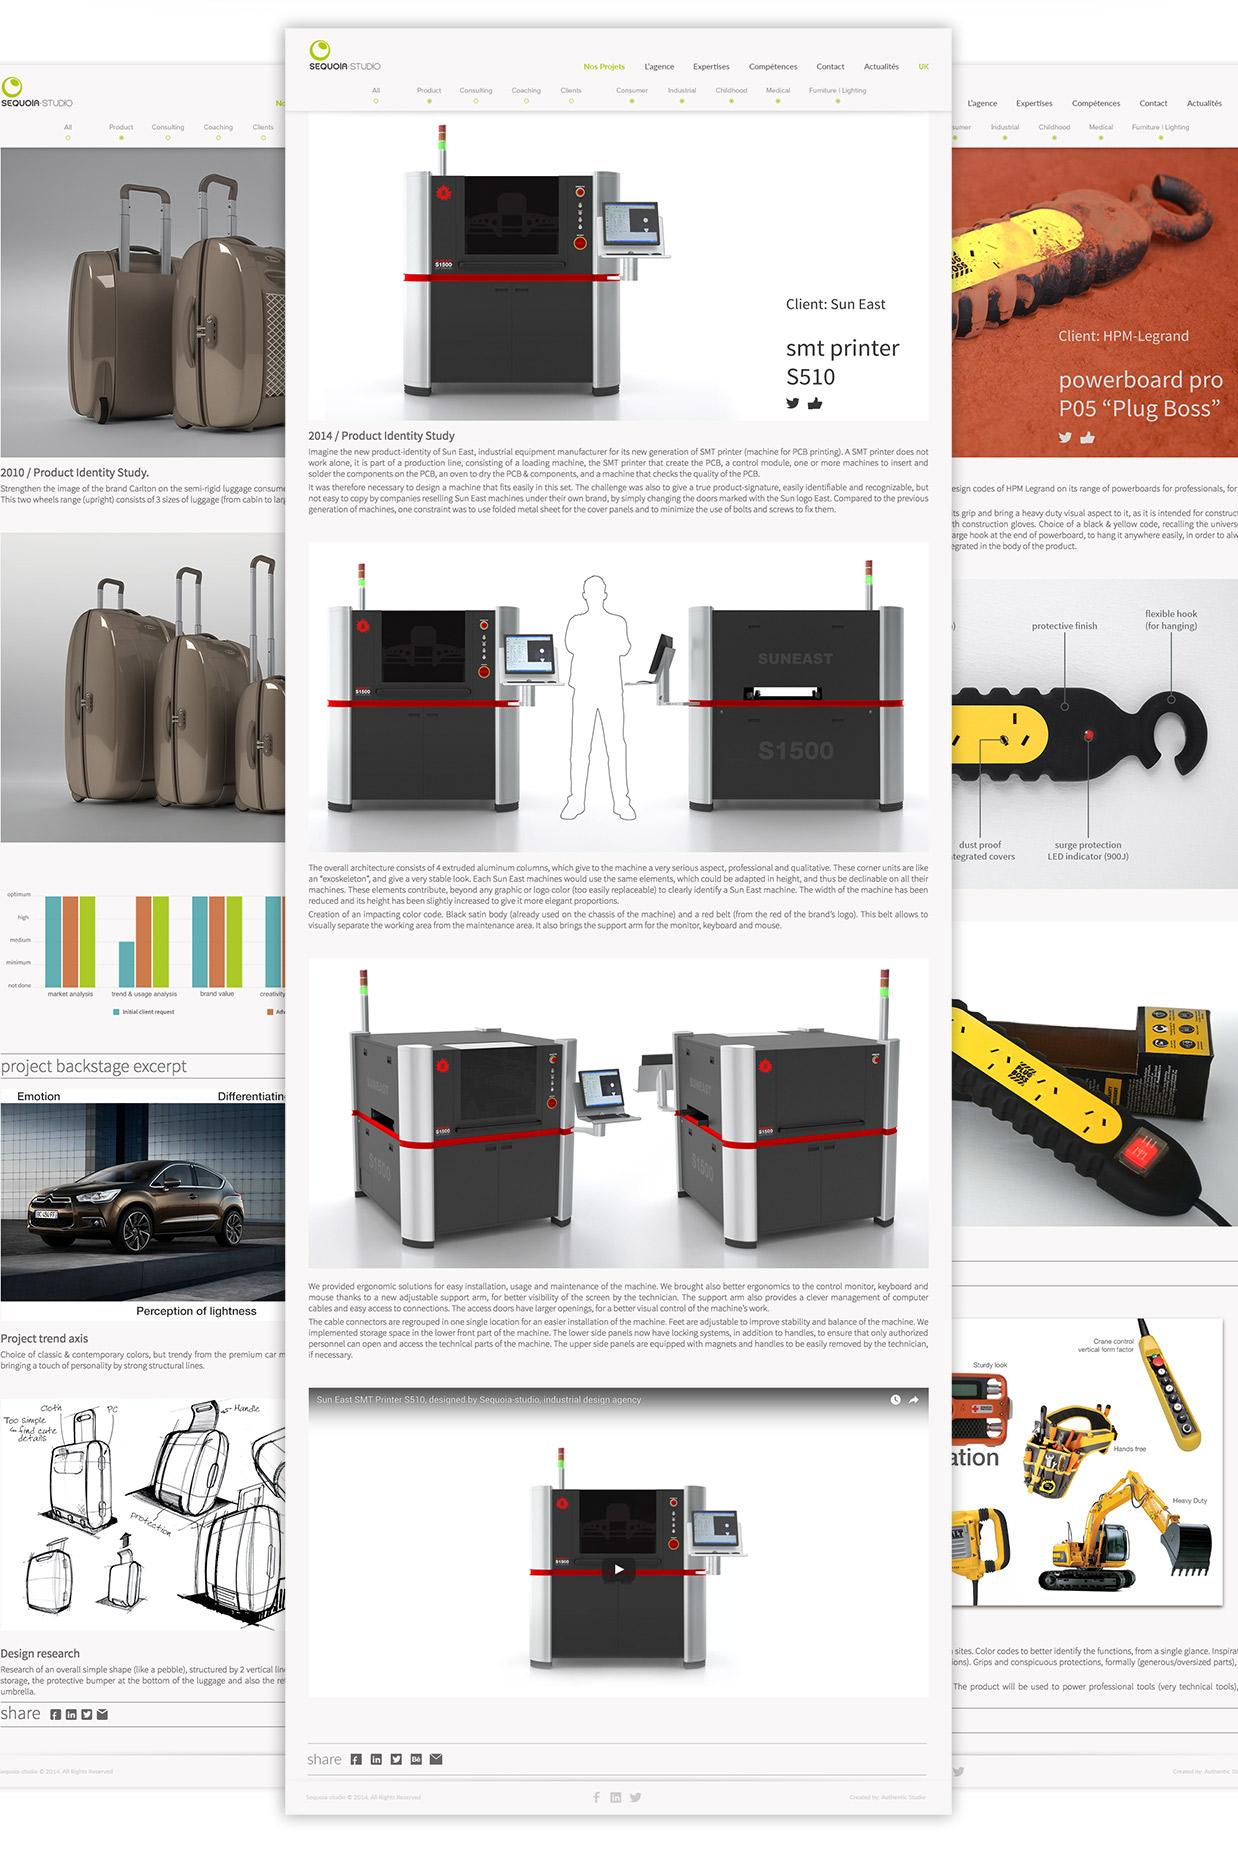 https://media.authentic-studio.com/web-content/uploads/2020/11/sequoia-studio-bespoke-cms-content-management-system-enhanced-example-4.jpg